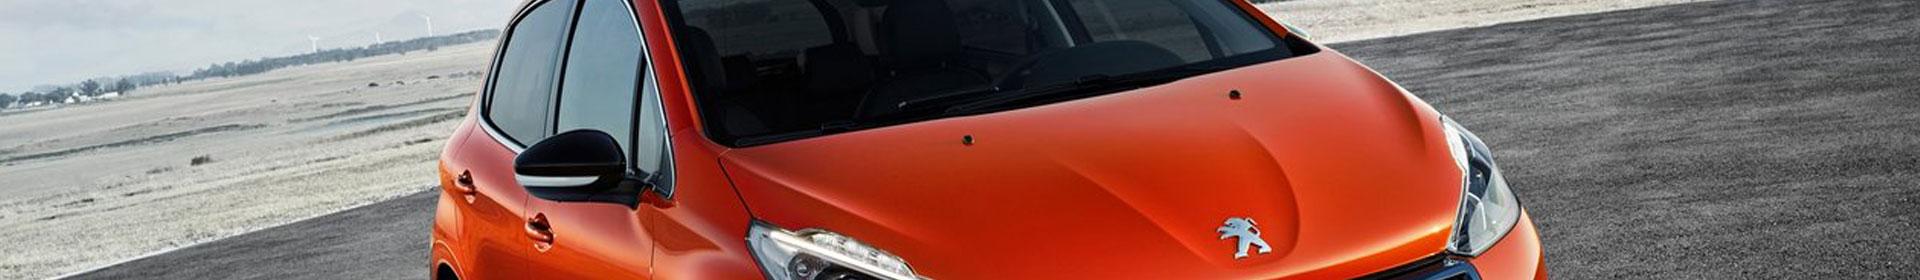 Auto Louwes nieuwe en gebruikte auto's - Private lease